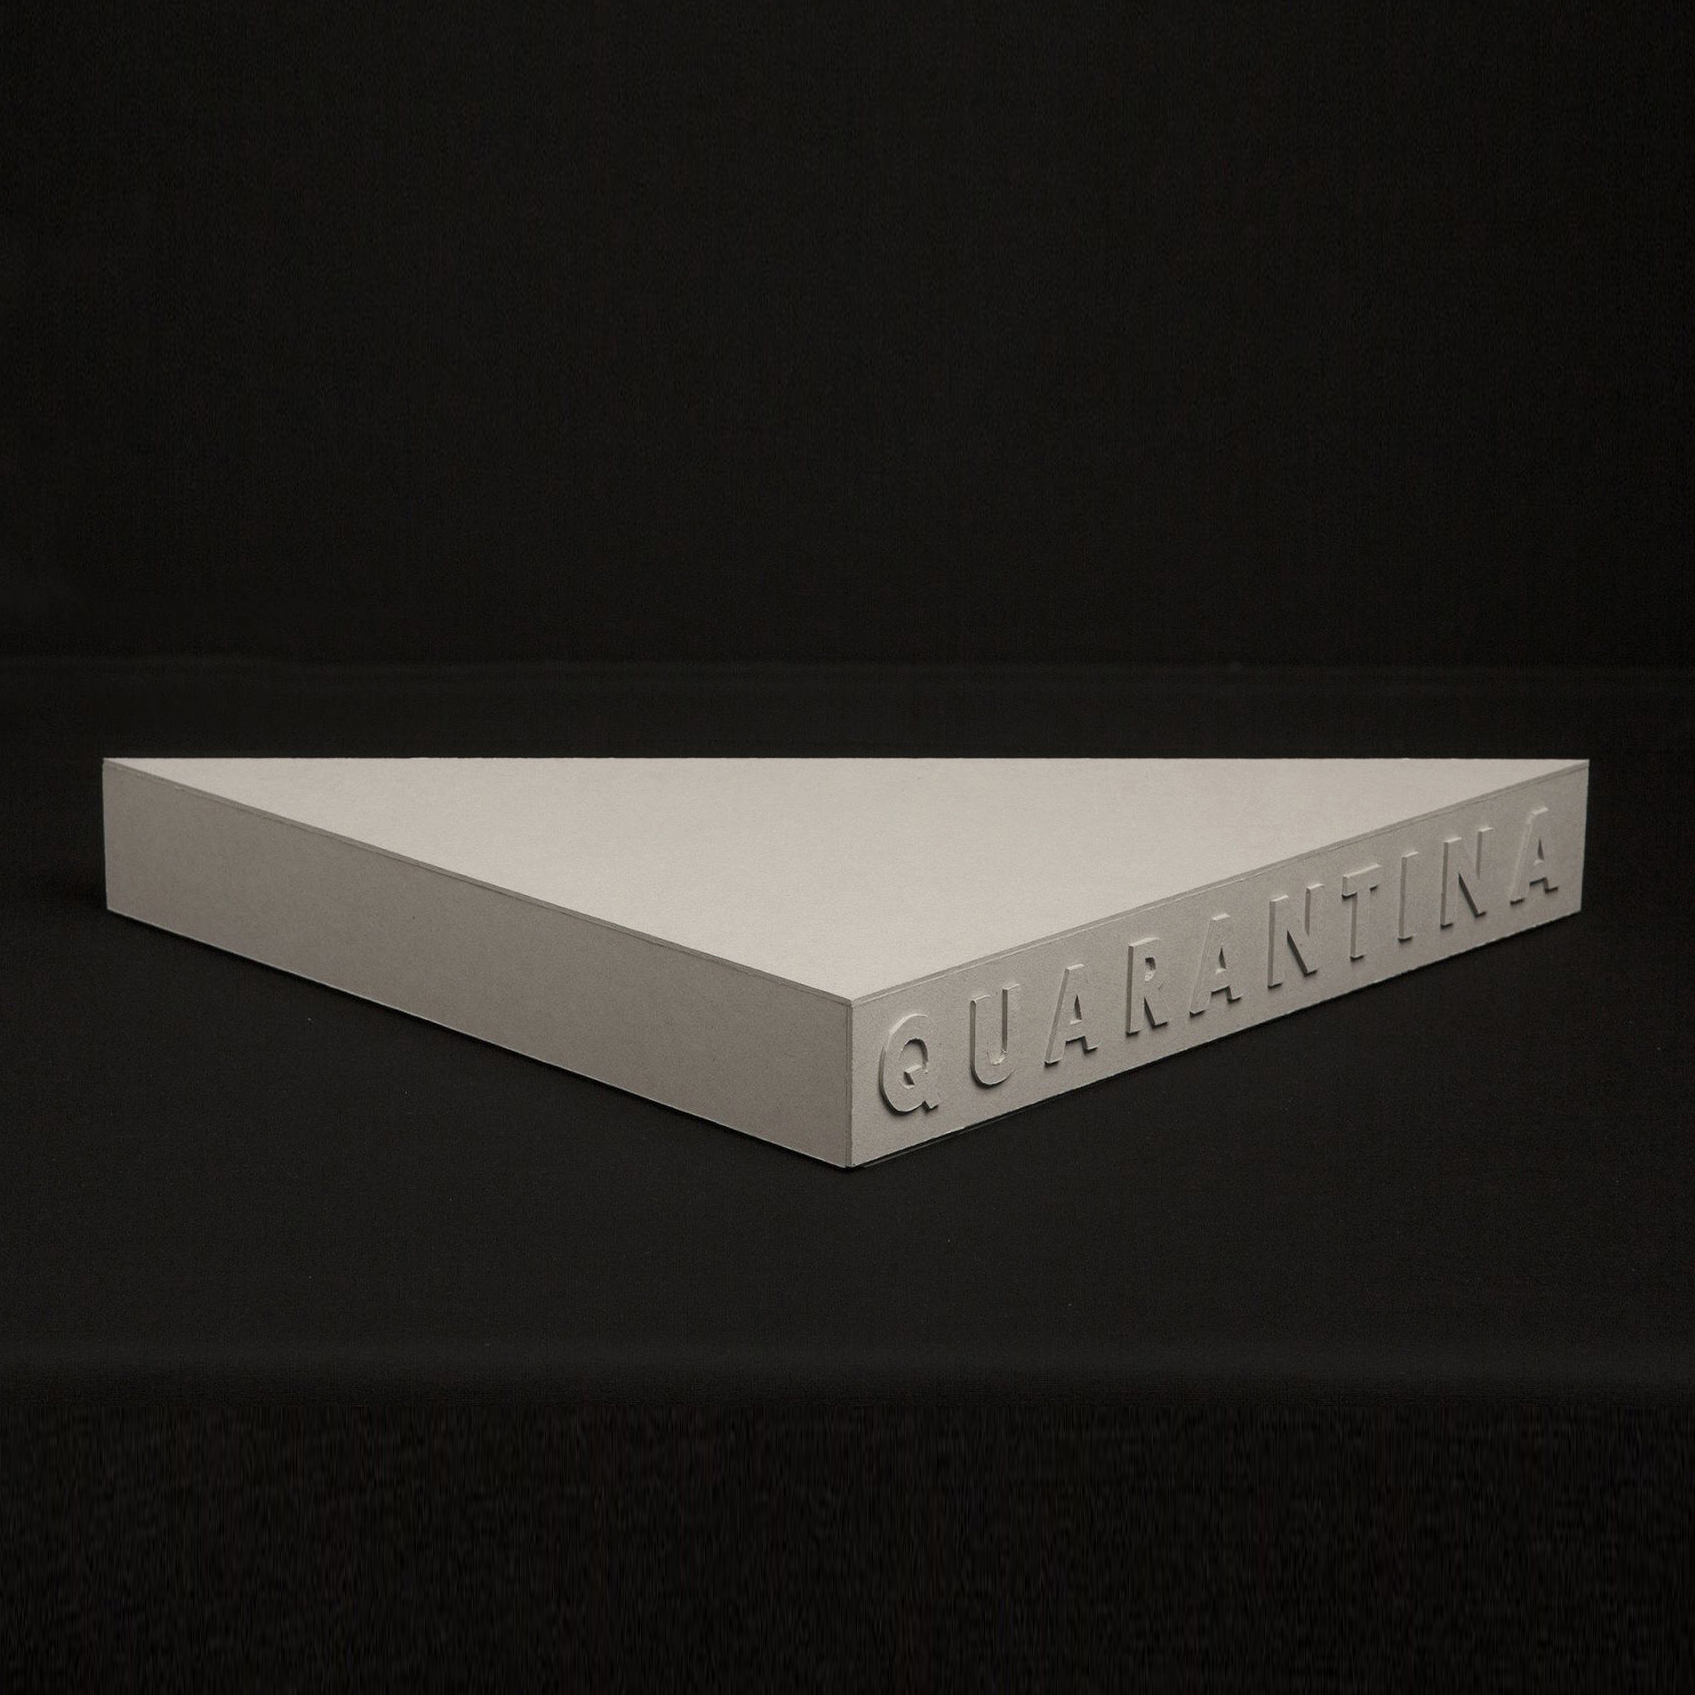 Quarantina 7x40x40cm(closed) Cardboard, paper, PVC, porcelain